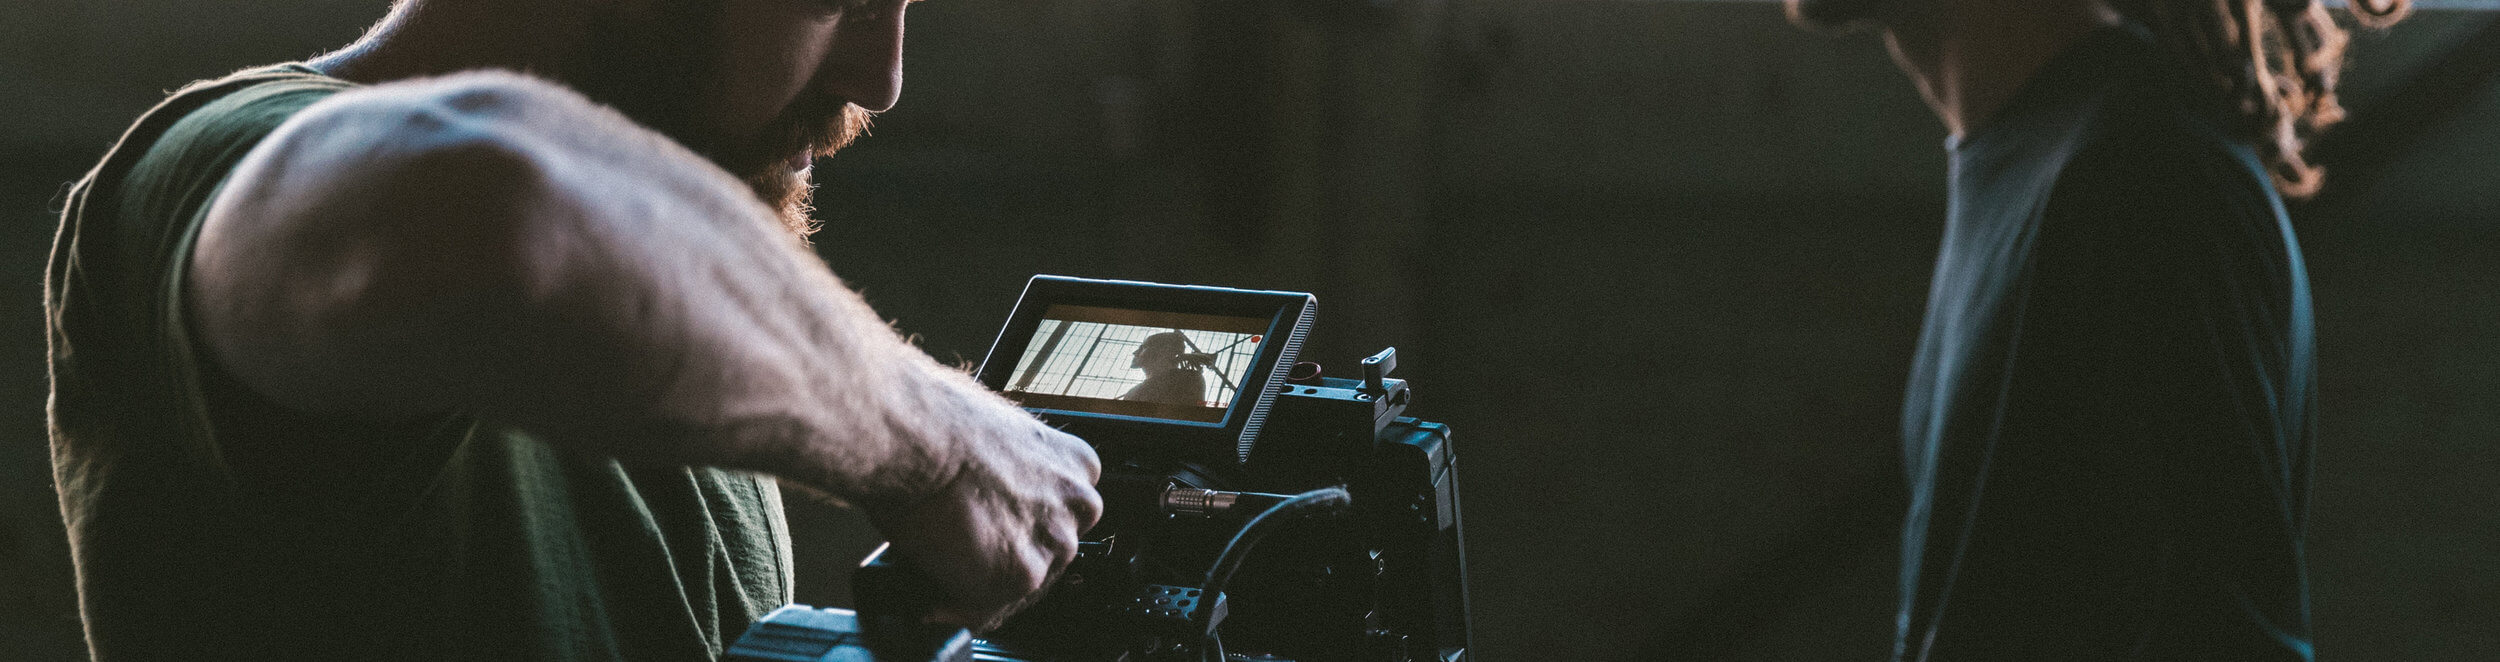 Cameraman shooting scene